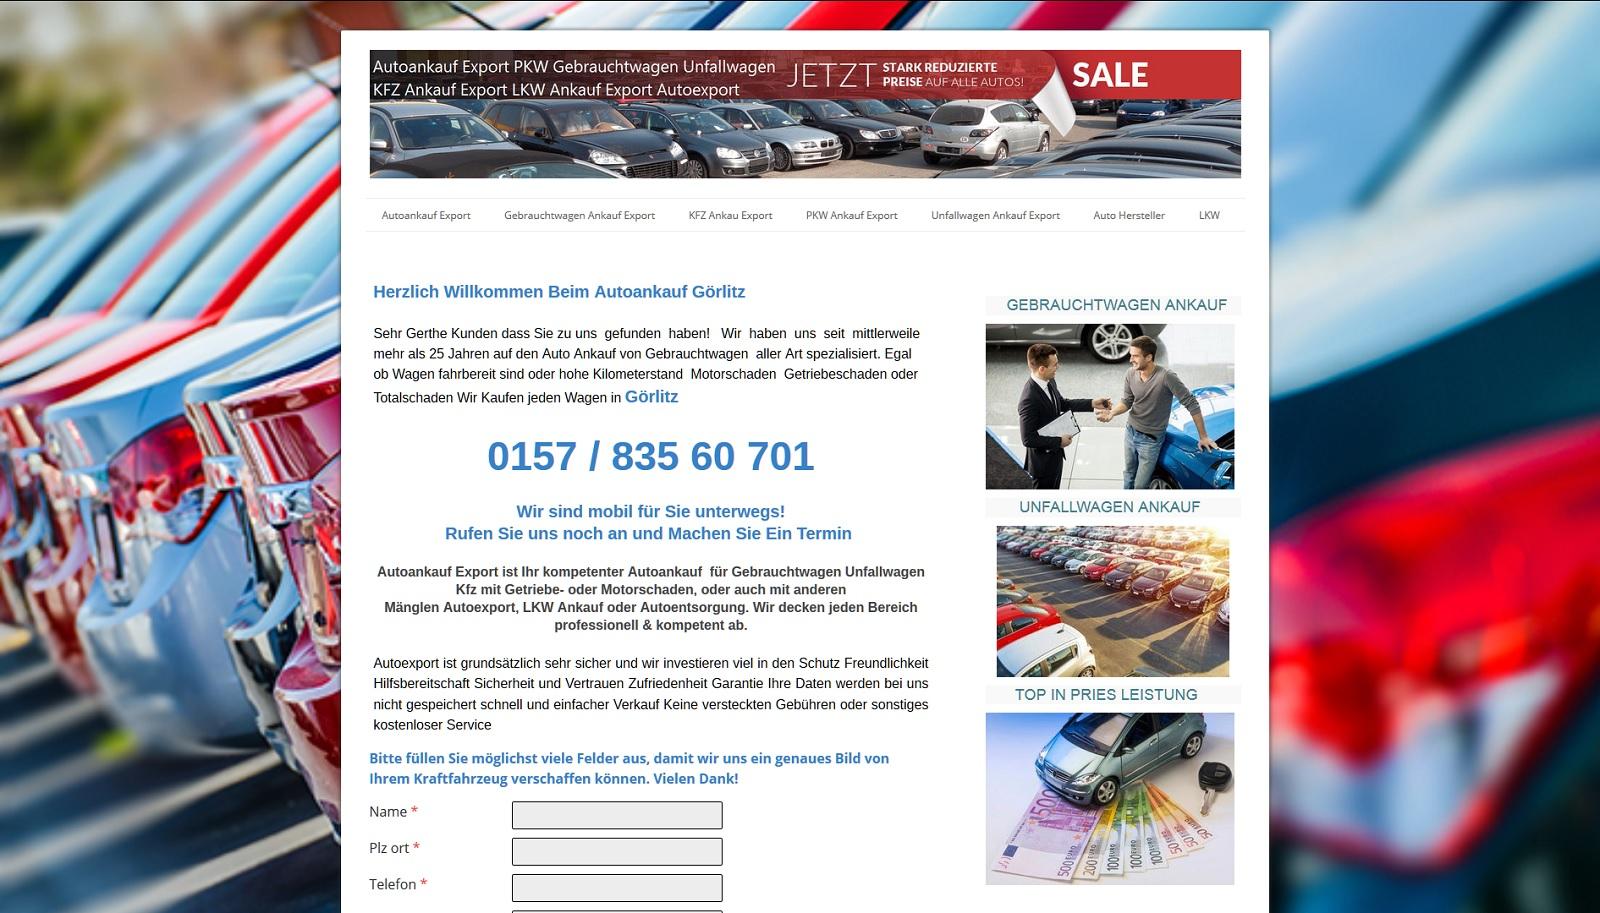 auto-ankauf-export.de - Autoankauf Papenburg